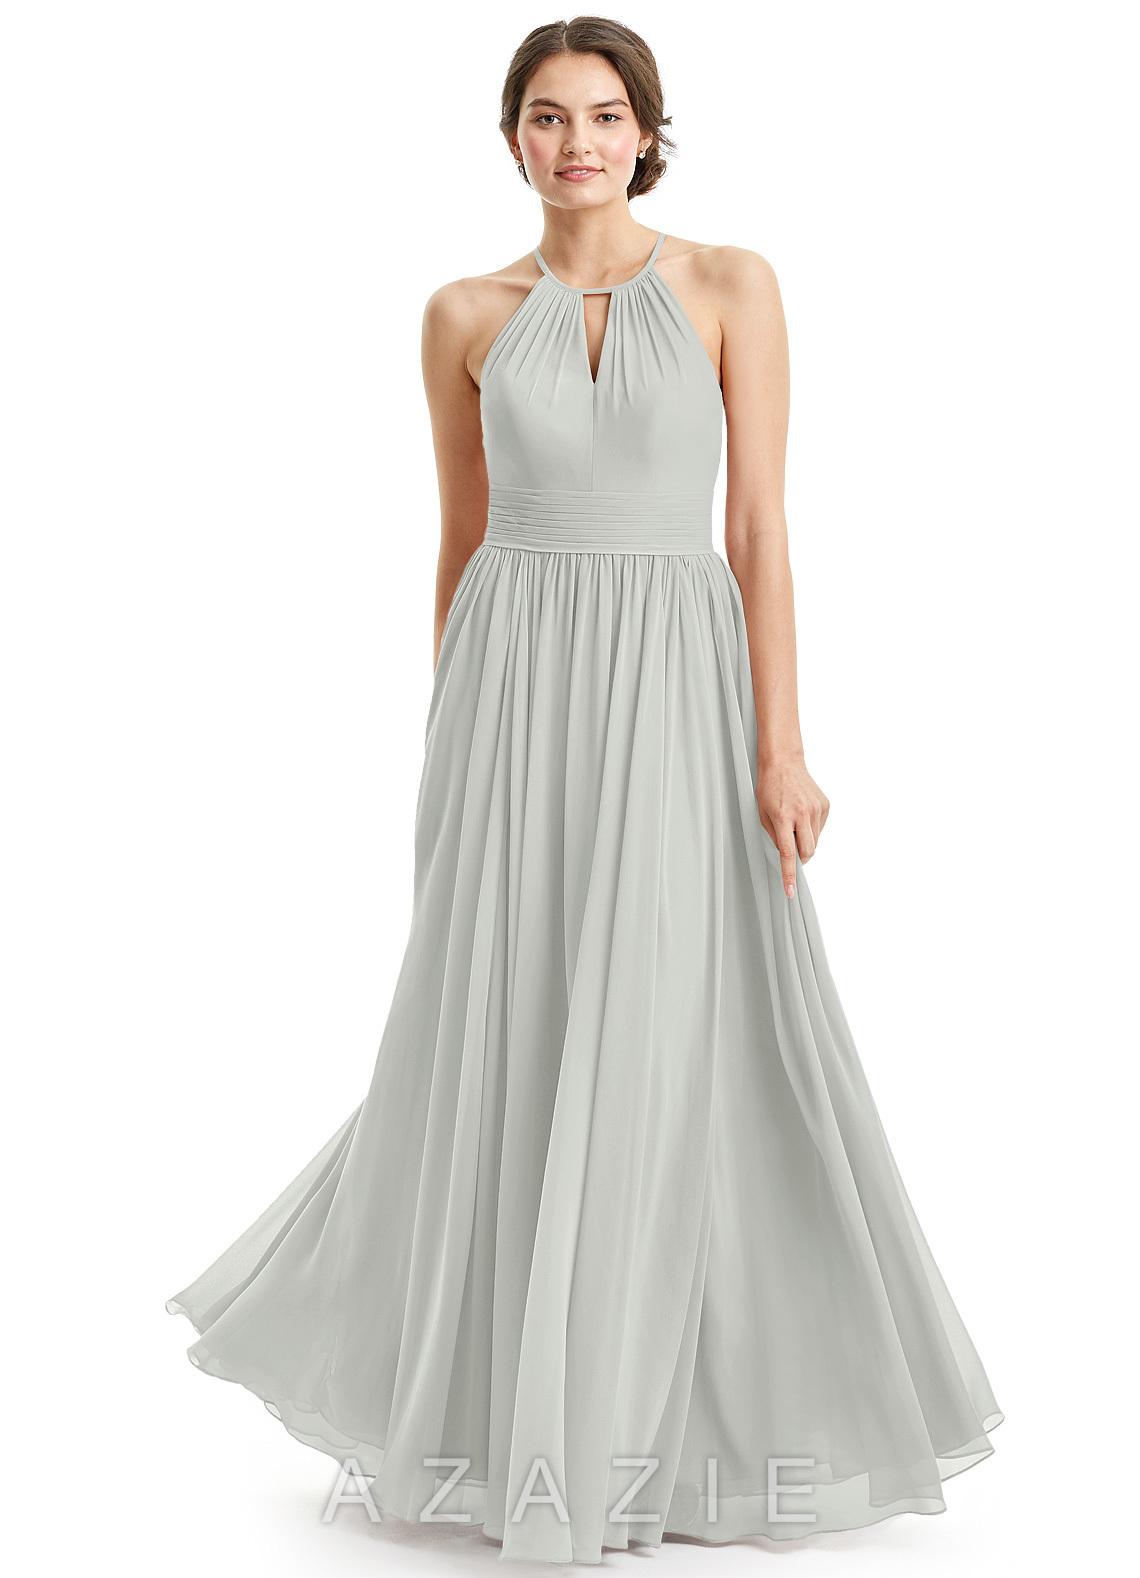 Silver bridesmaid dresses silver gowns azazie azazie cherish azazie cherish ombrellifo Choice Image